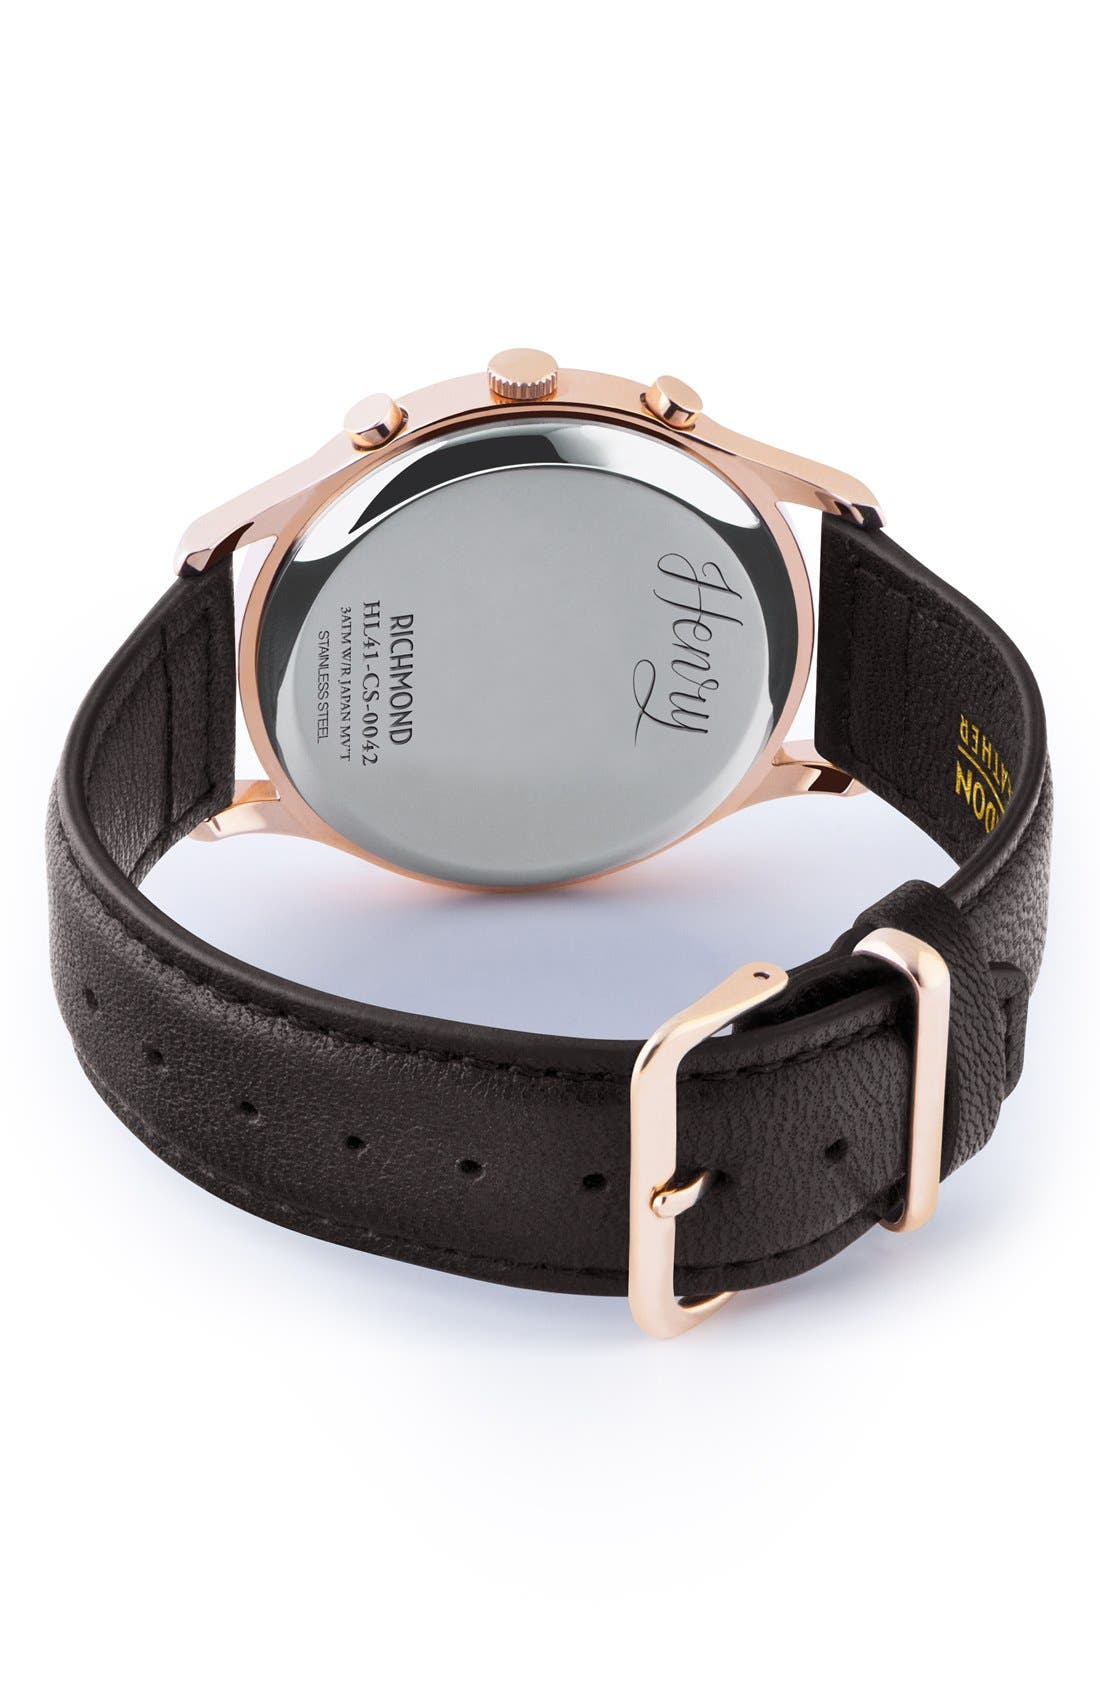 'Richmond' Chronograph Leather Strap Watch, 41mm,                             Alternate thumbnail 2, color,                             001